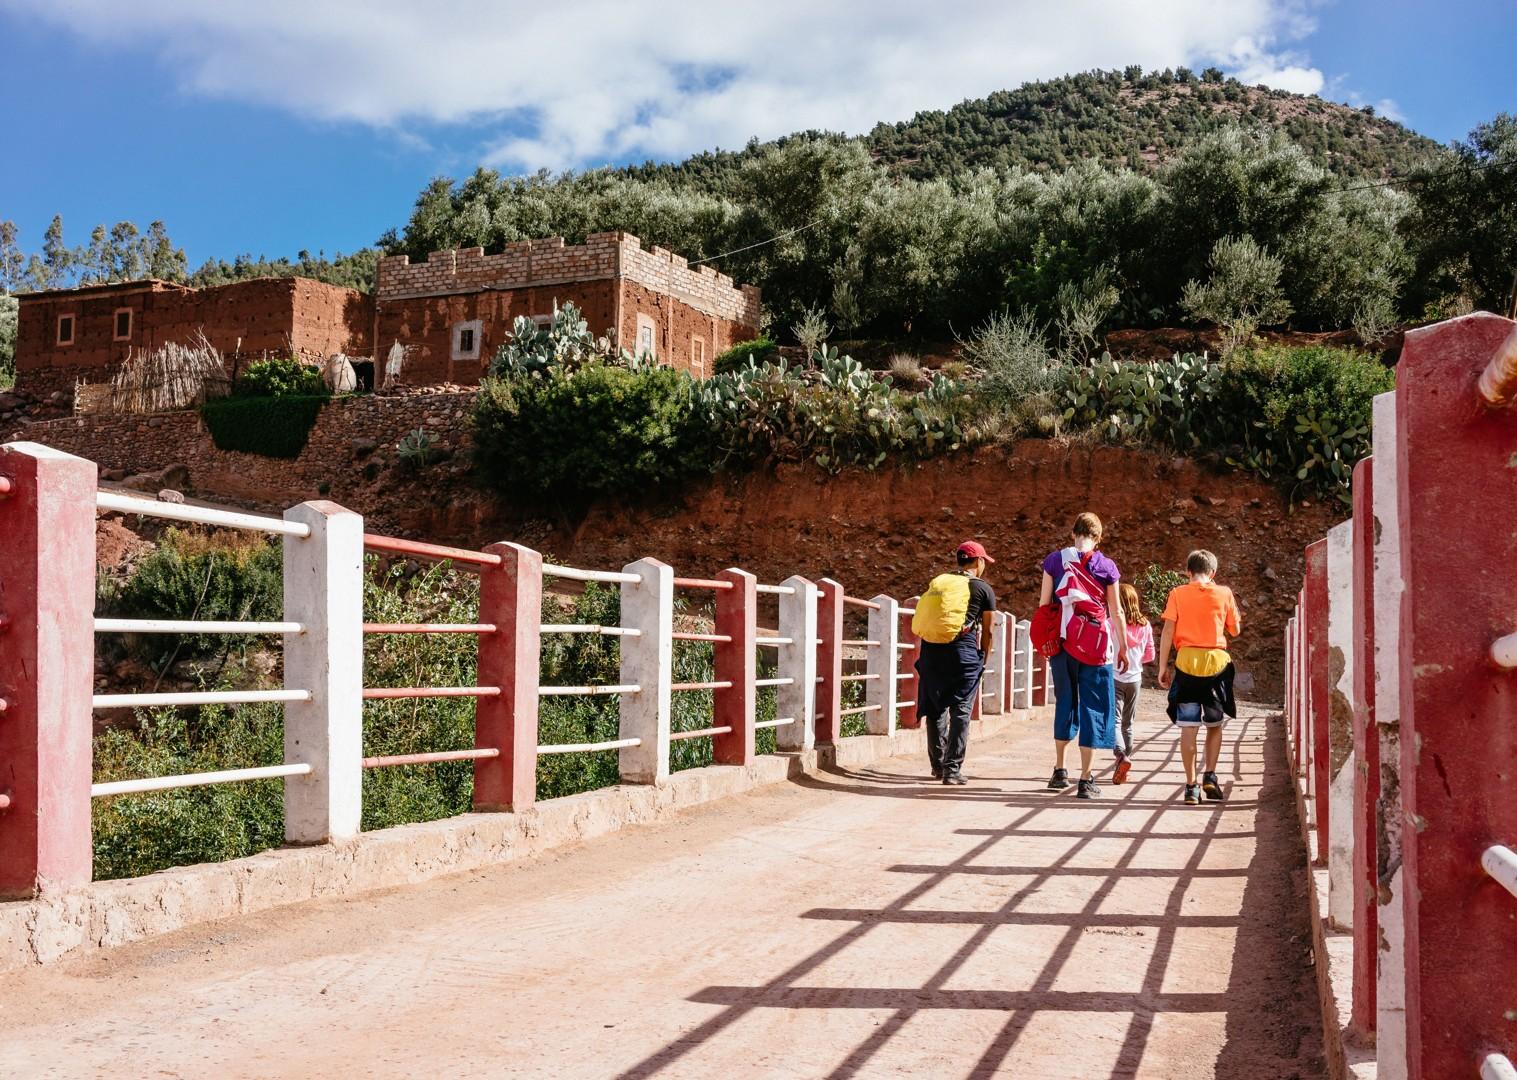 Family-Cycling-Holiday-Morocco-Desert-Mountains-ride-into-Marrakech - Morocco - Desert, Mountains and Coast - Family Cycling